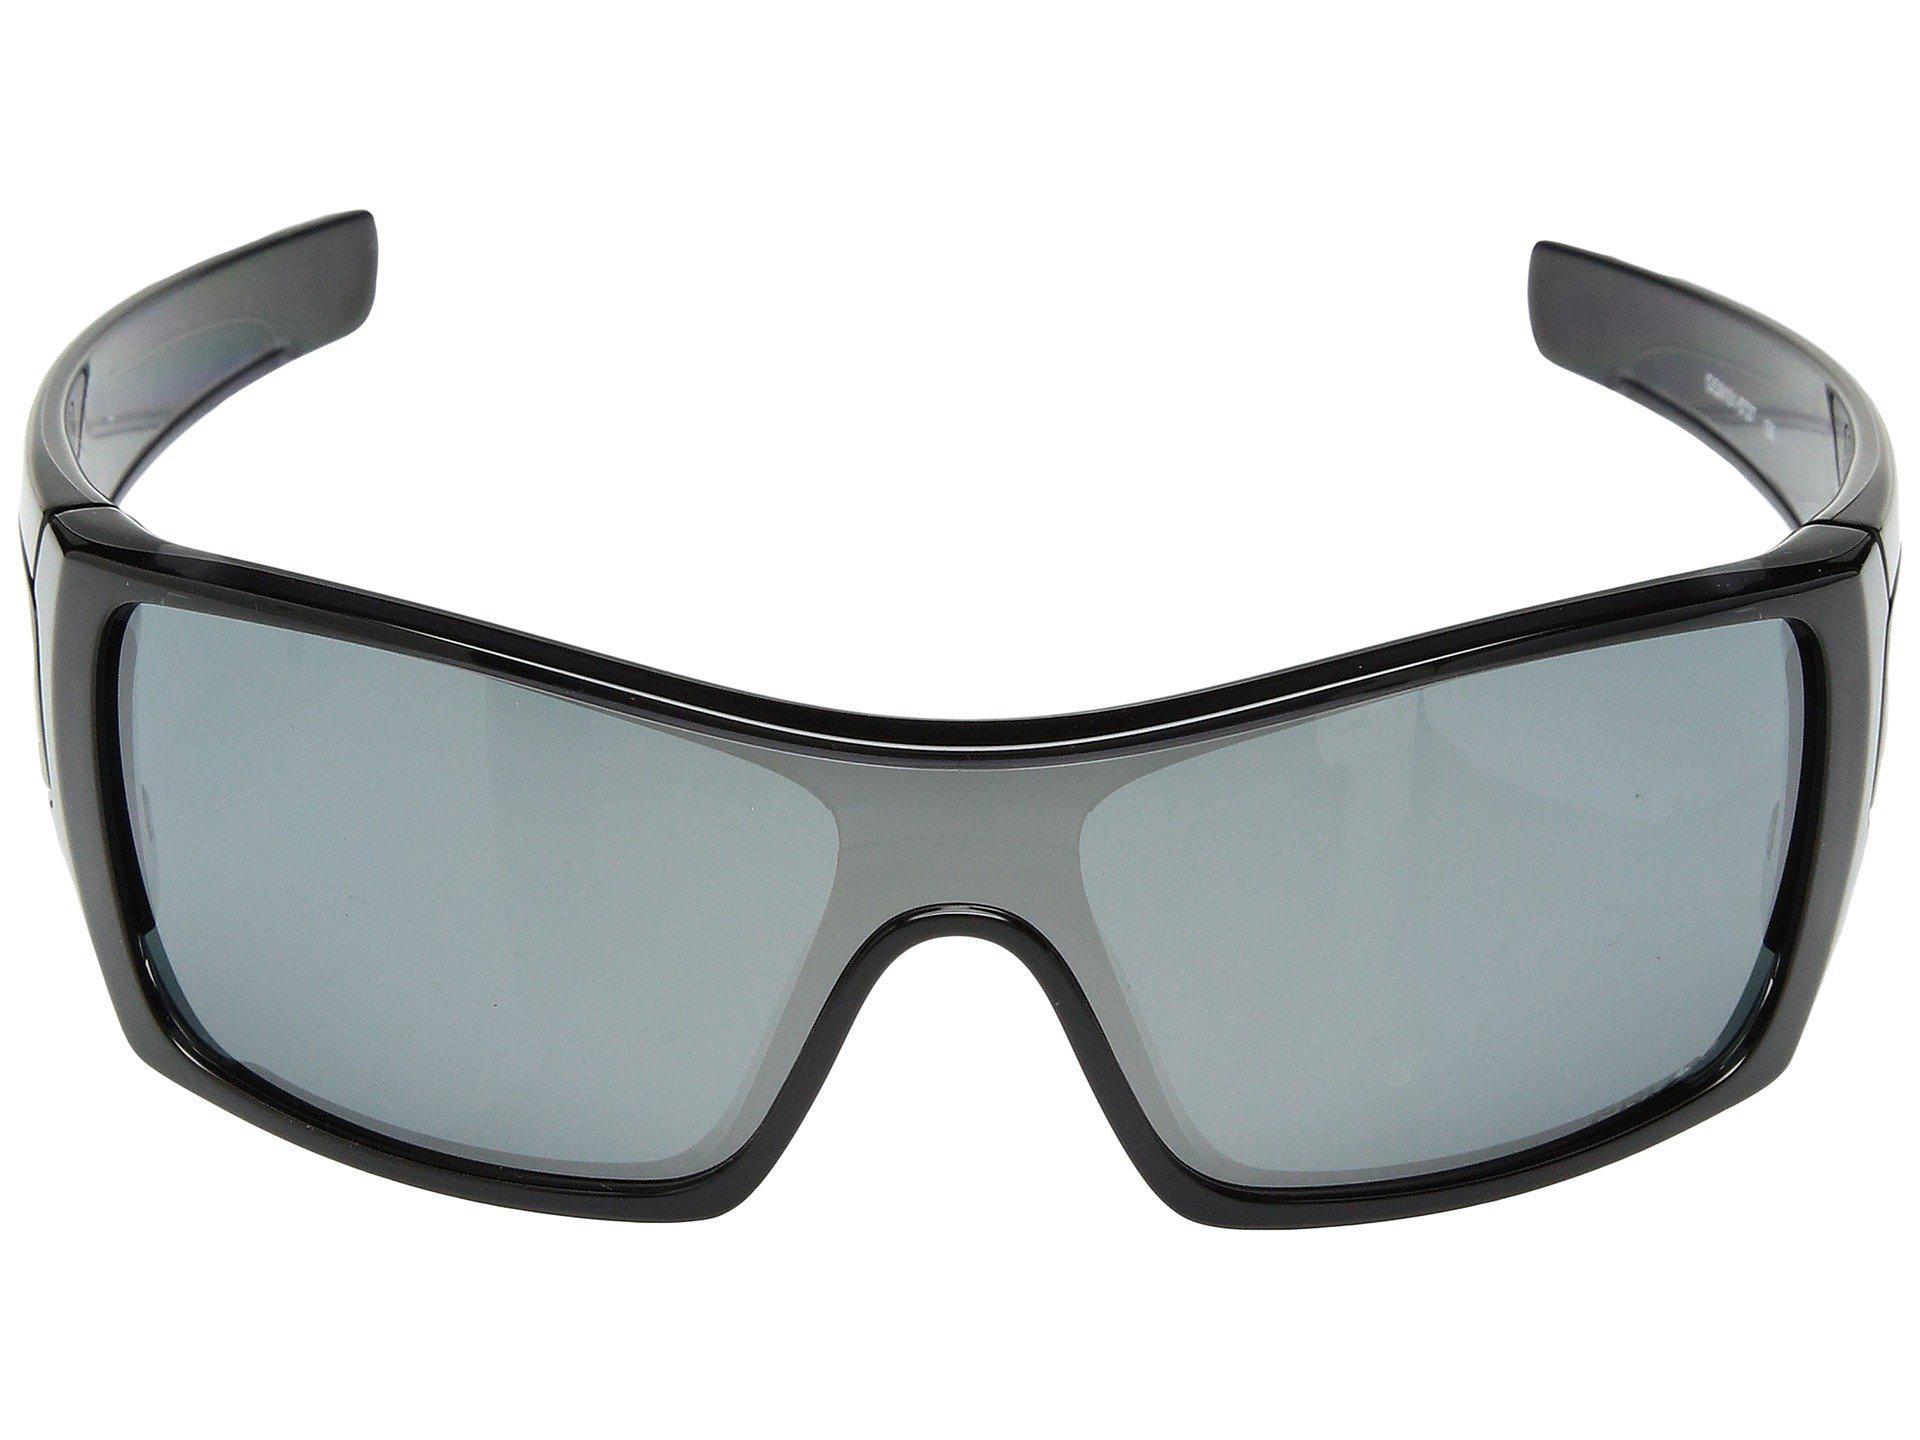 01482a6c06 Oakley - Batwolf (black Ink W  Prizm Black) Sport Sunglasses for Men -.  View fullscreen